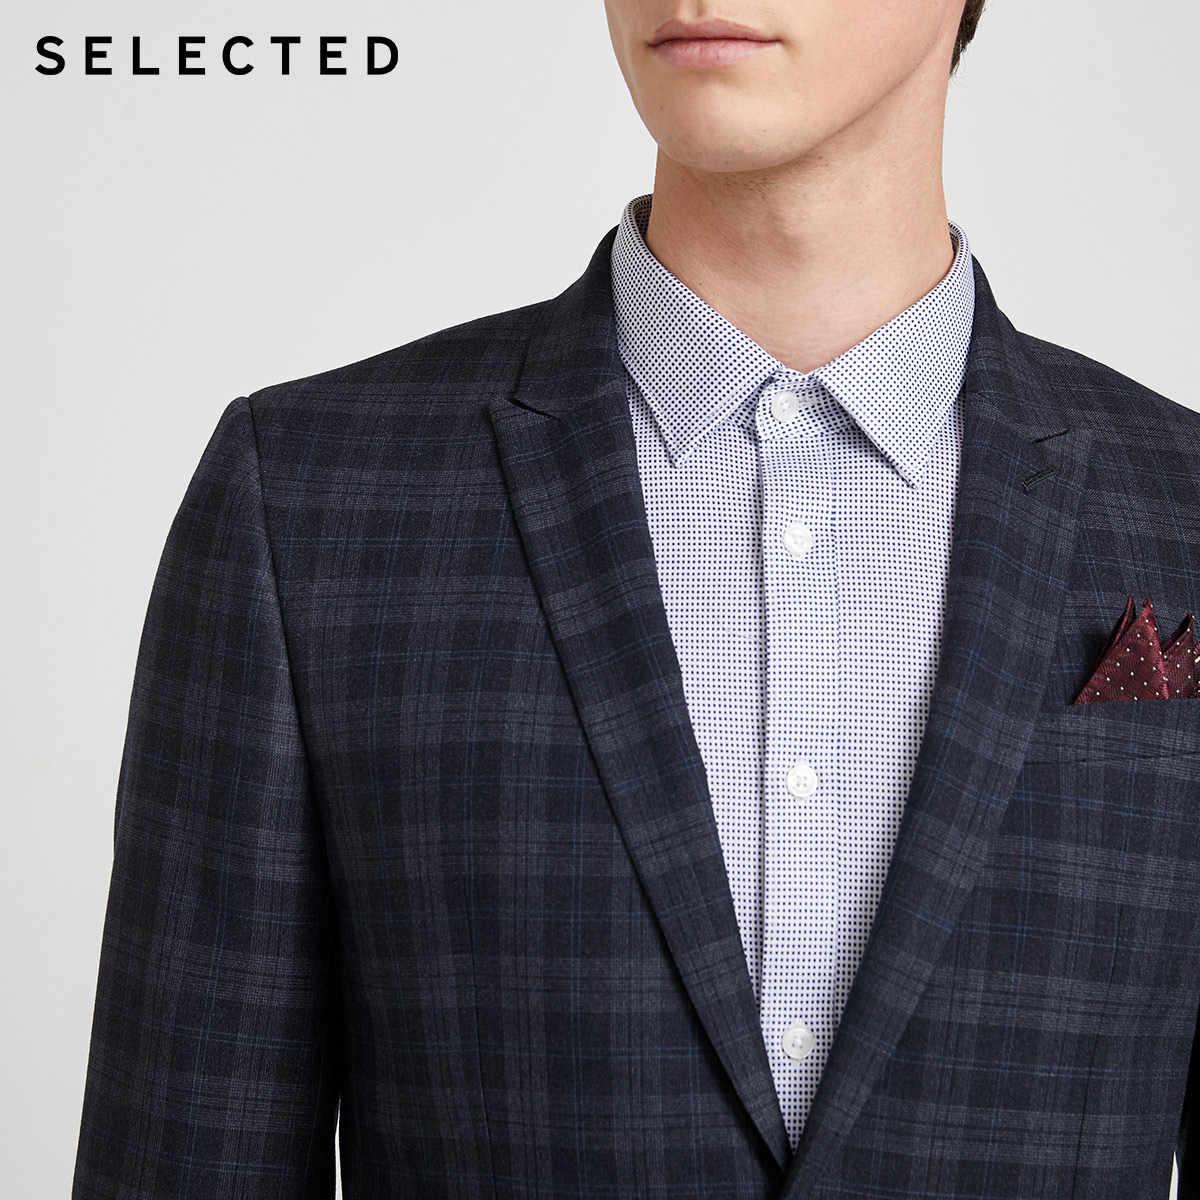 SELECTED 남성 슬림 피트 체크 블레이저 체크 무늬 레트로 비즈니스 자켓 SIG | 42015X501